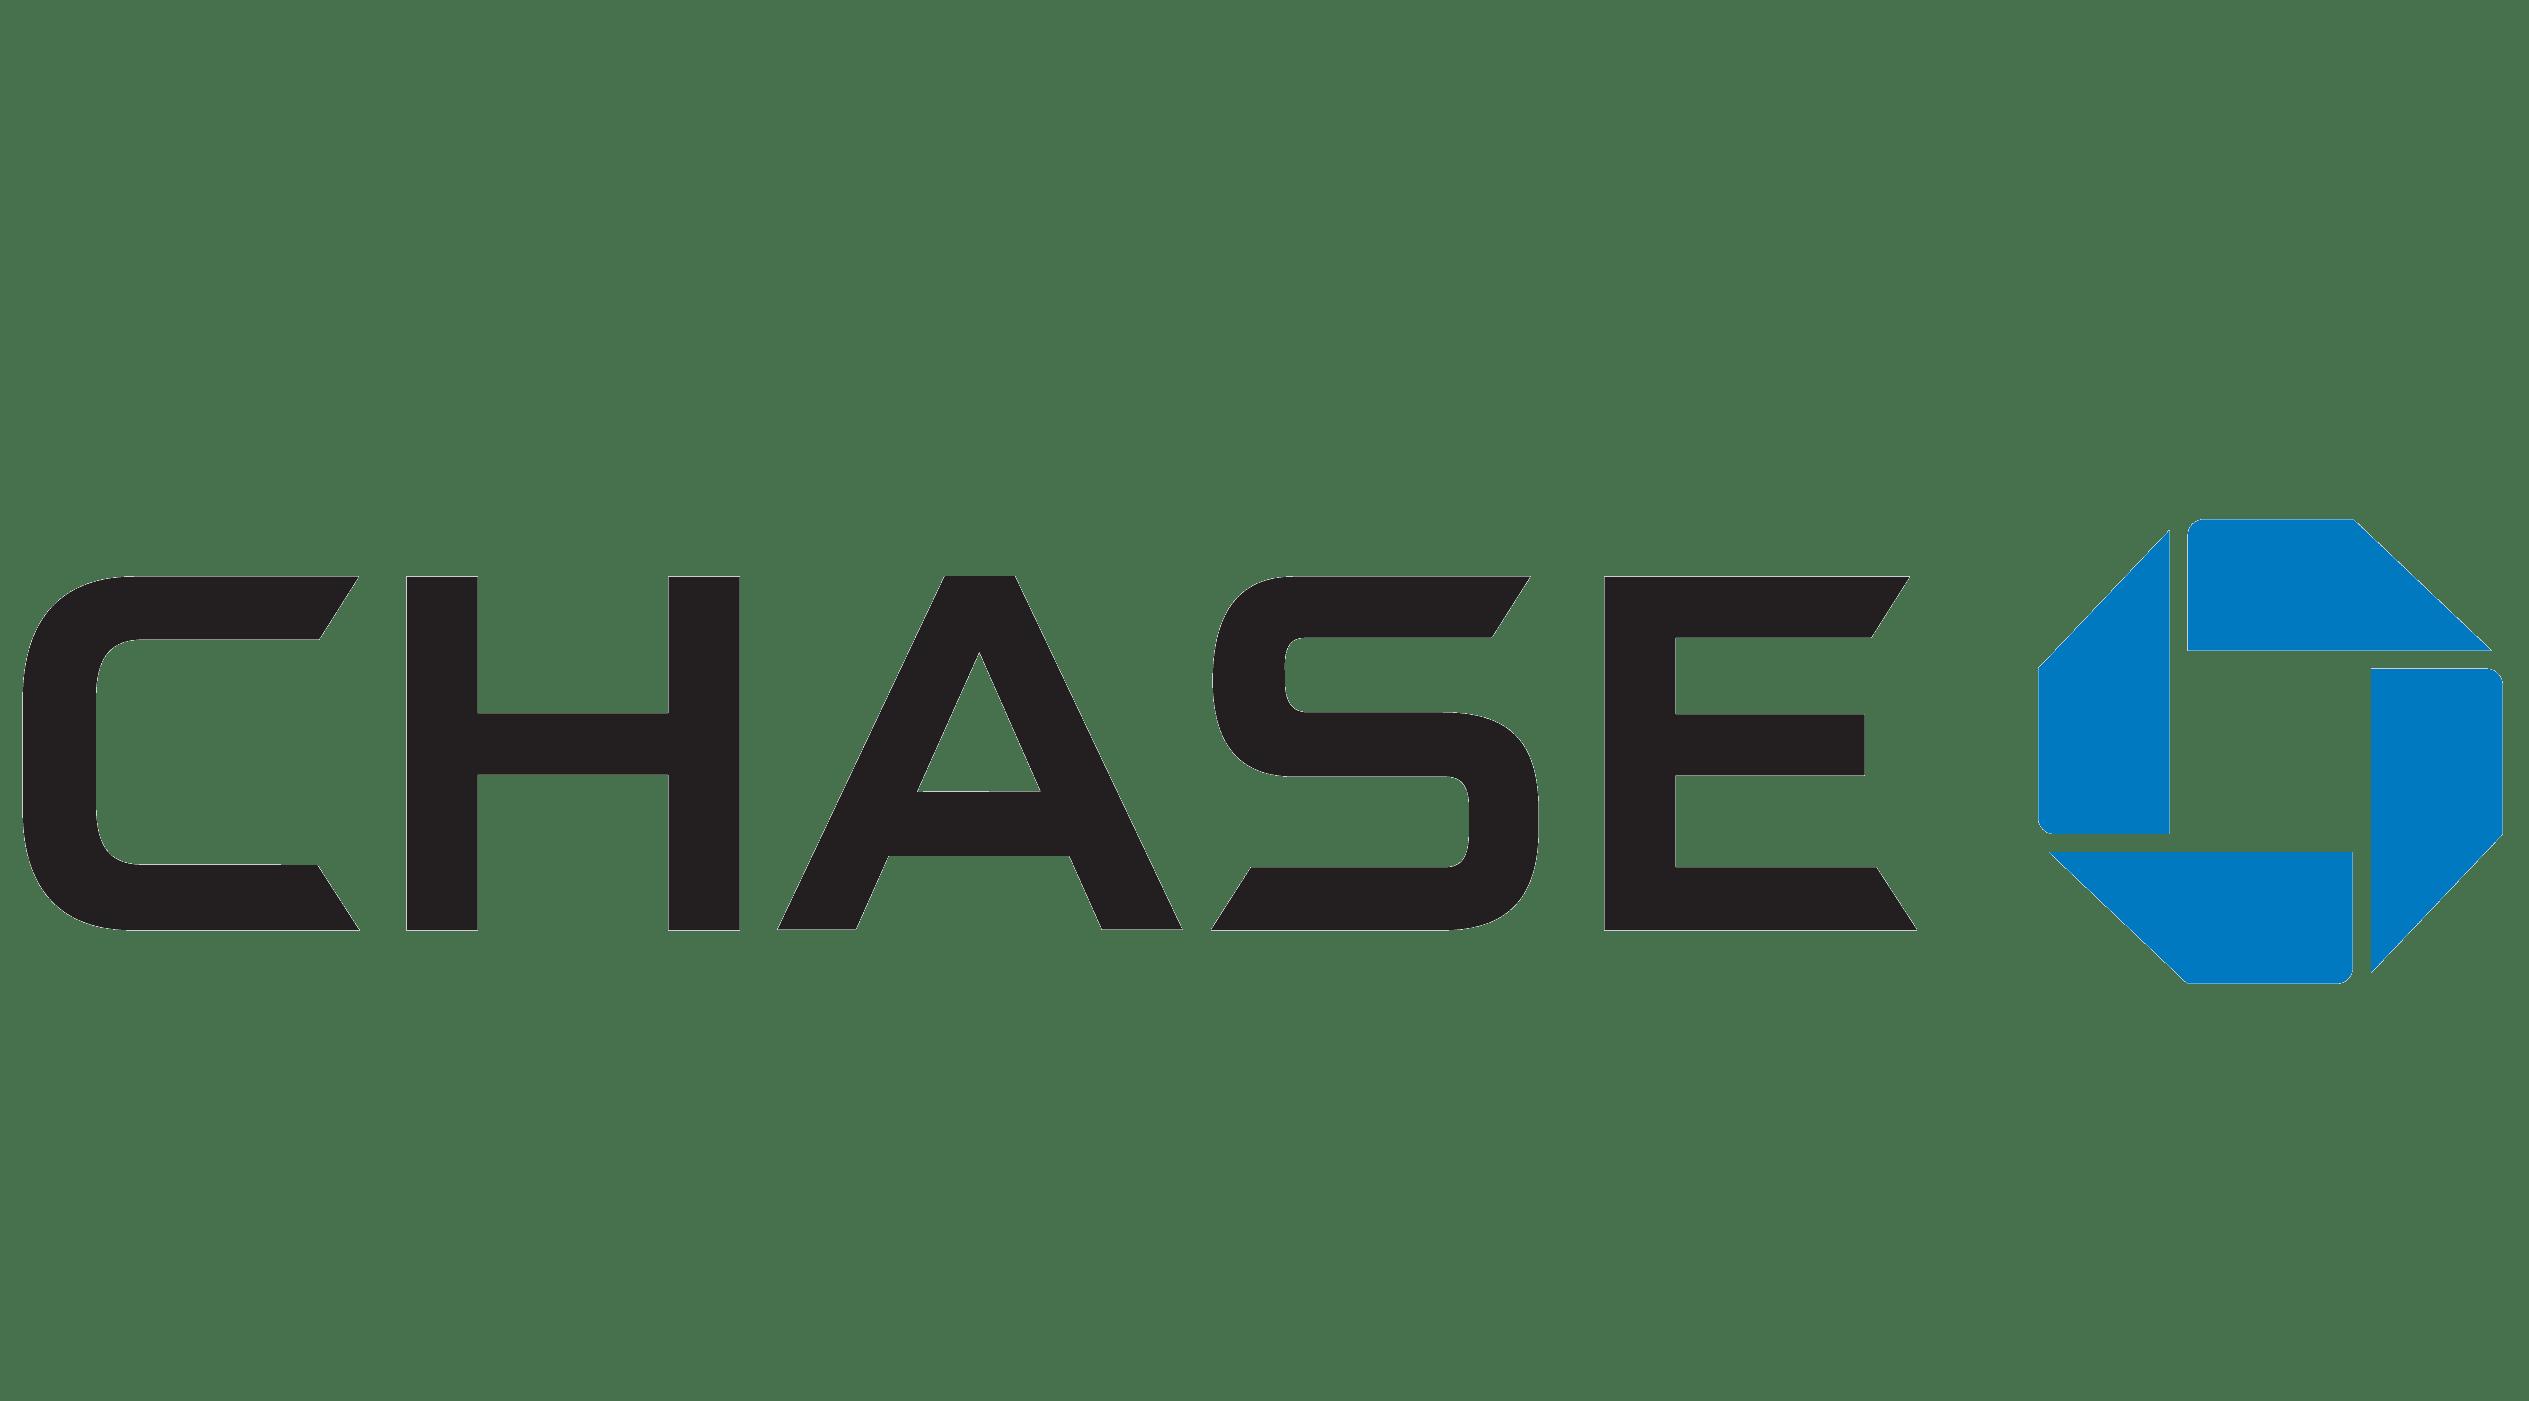 chase bank jumpcon sponsor